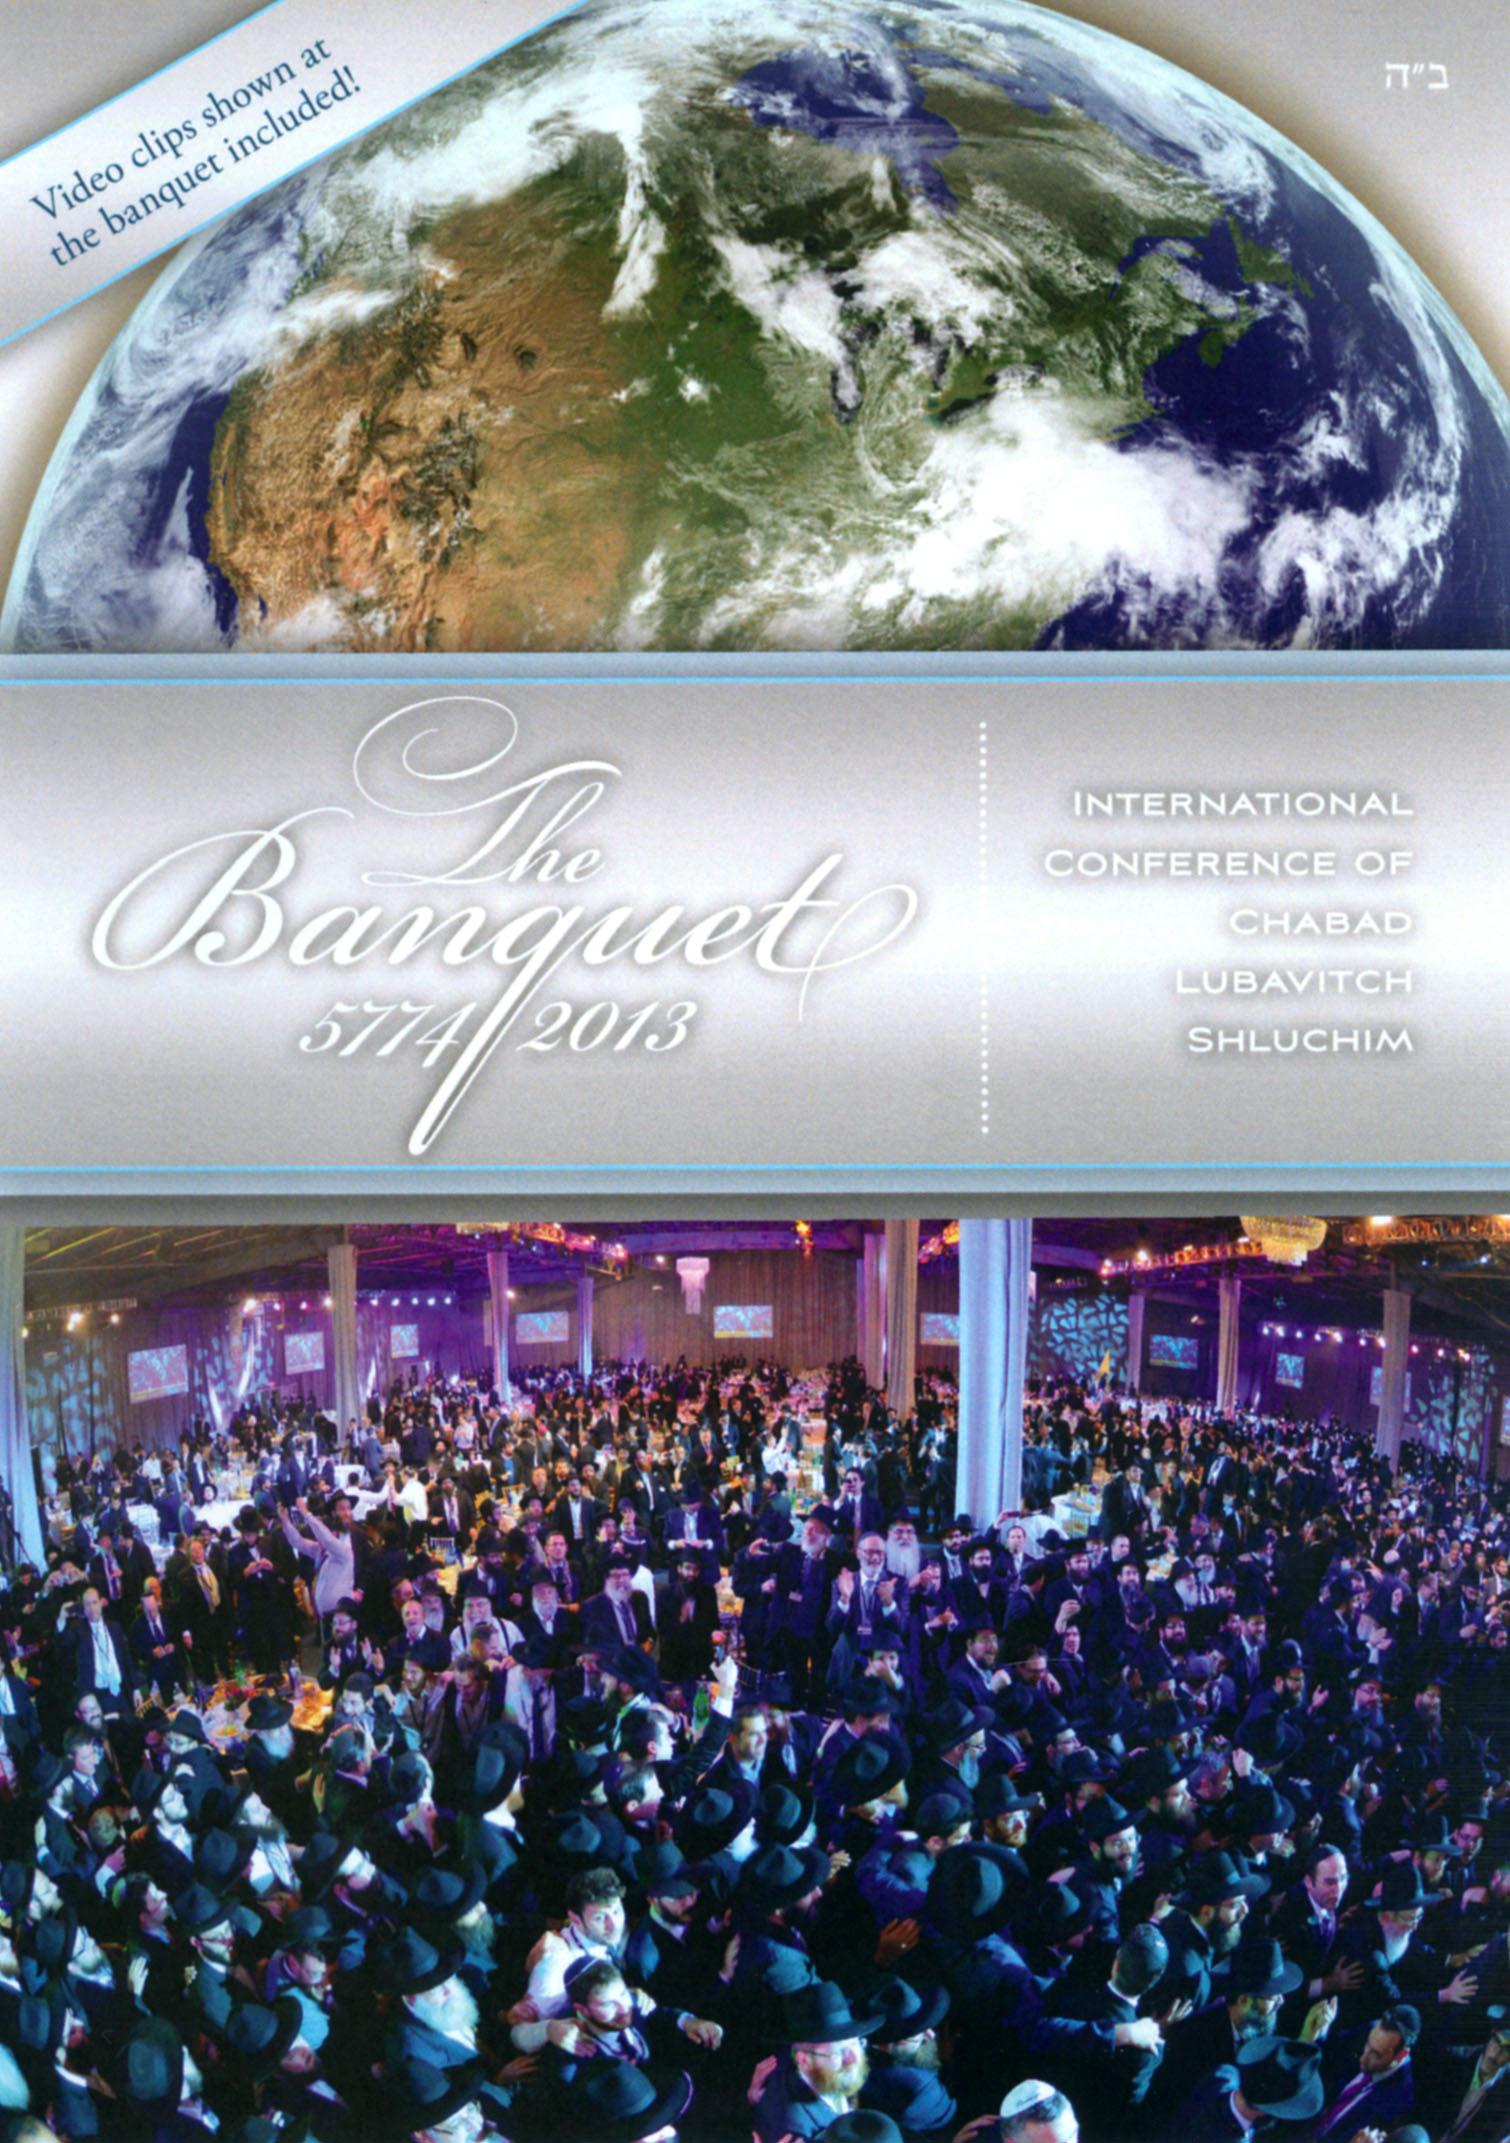 The Banquet 5774-2013